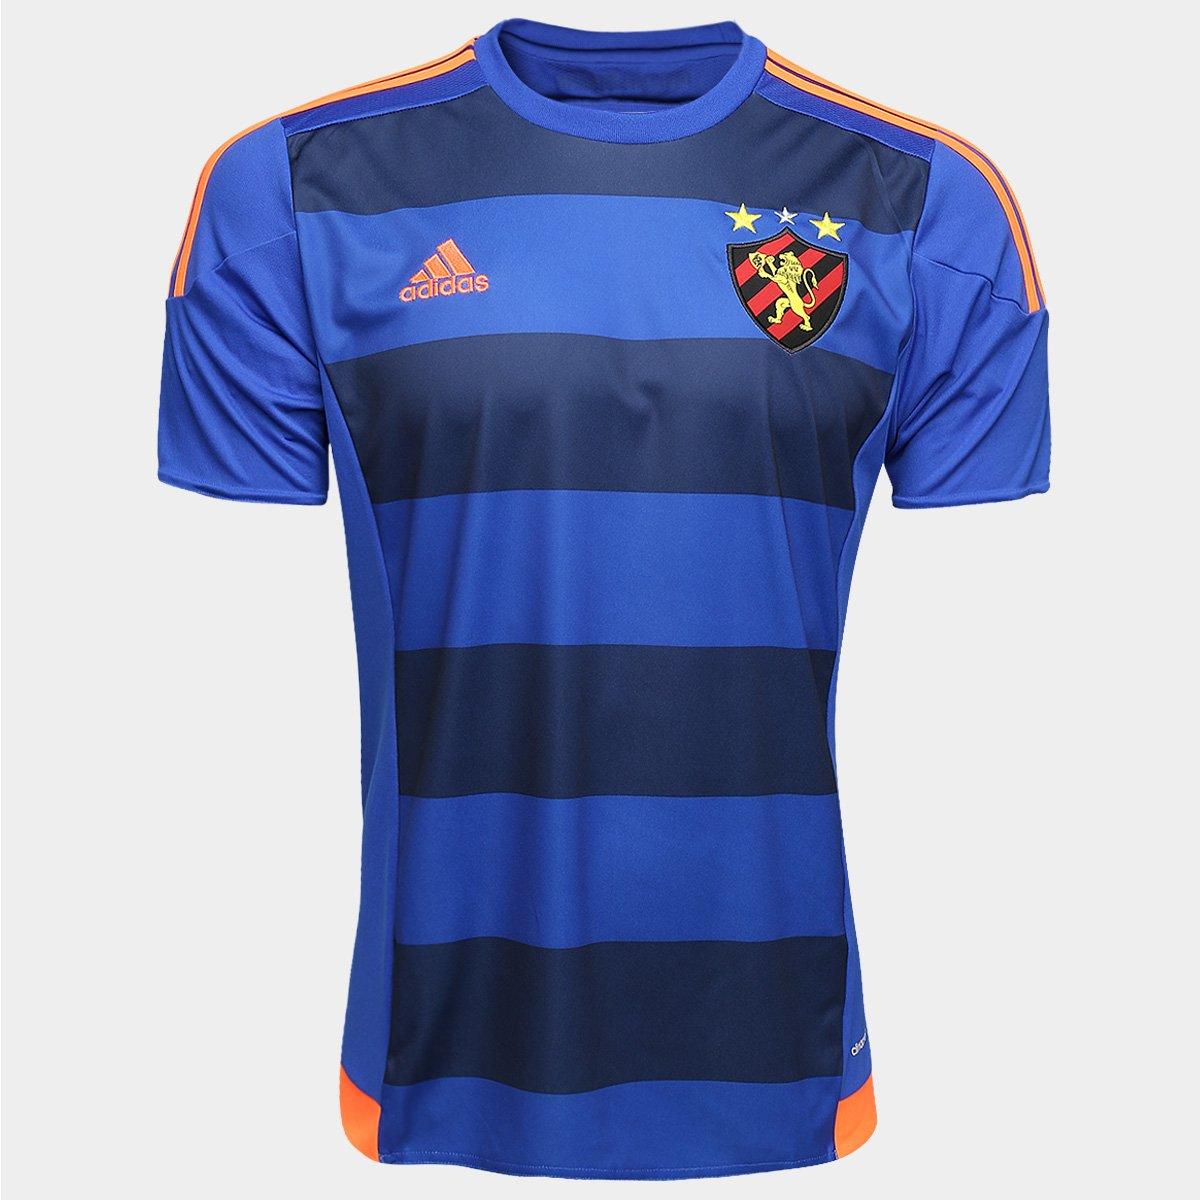 1f8bcda385 Camisa Sport Recife III 15 16 s nº - Torcedor Adidas Masculina - Compre  Agora